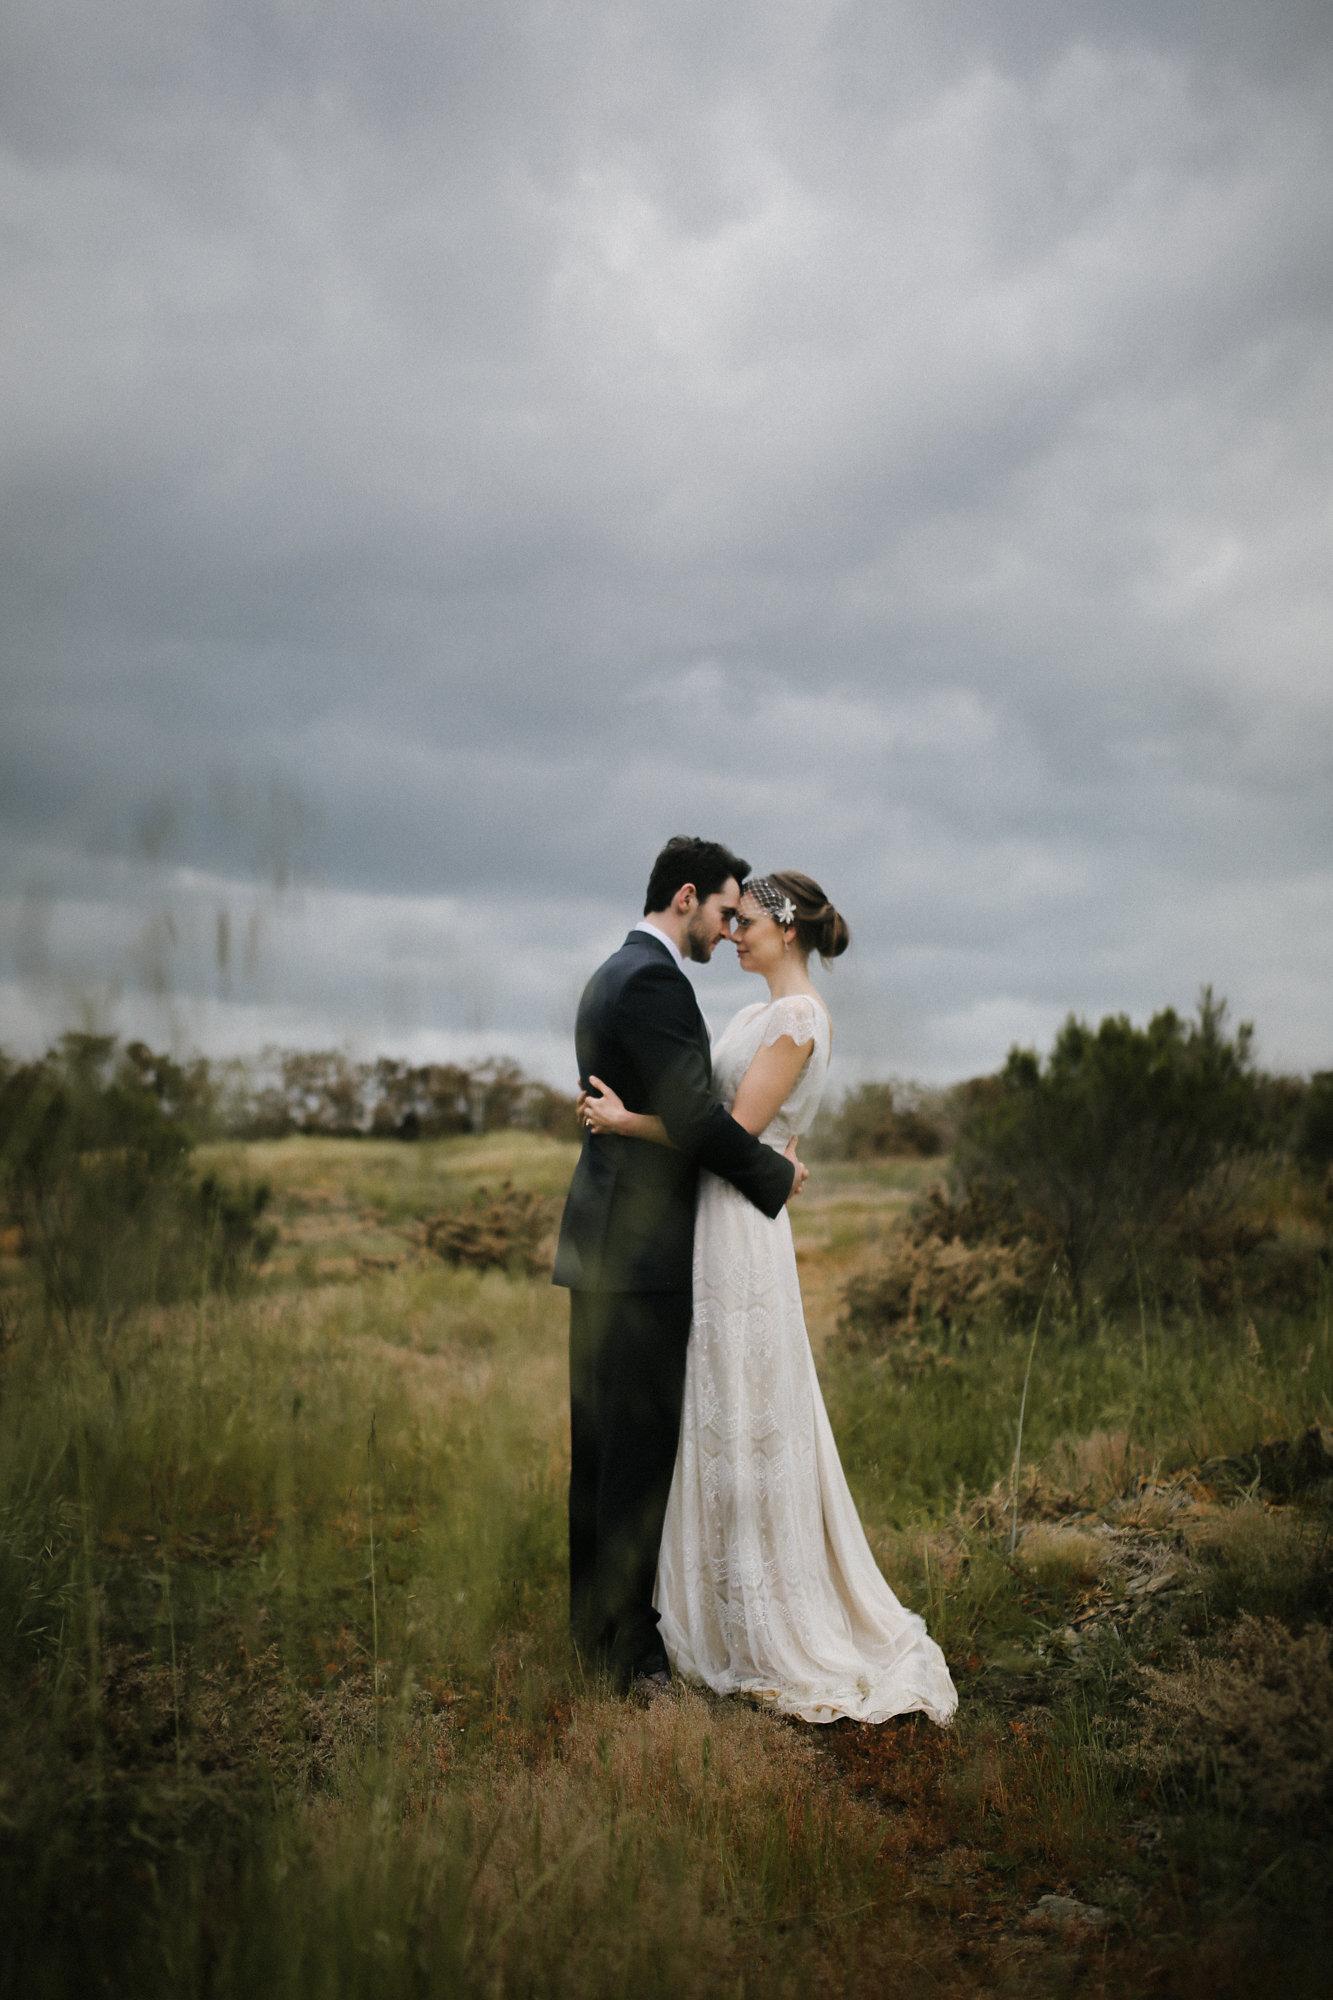 Kirsten&Tim-BrownPaperParcelPhotography-155.jpg